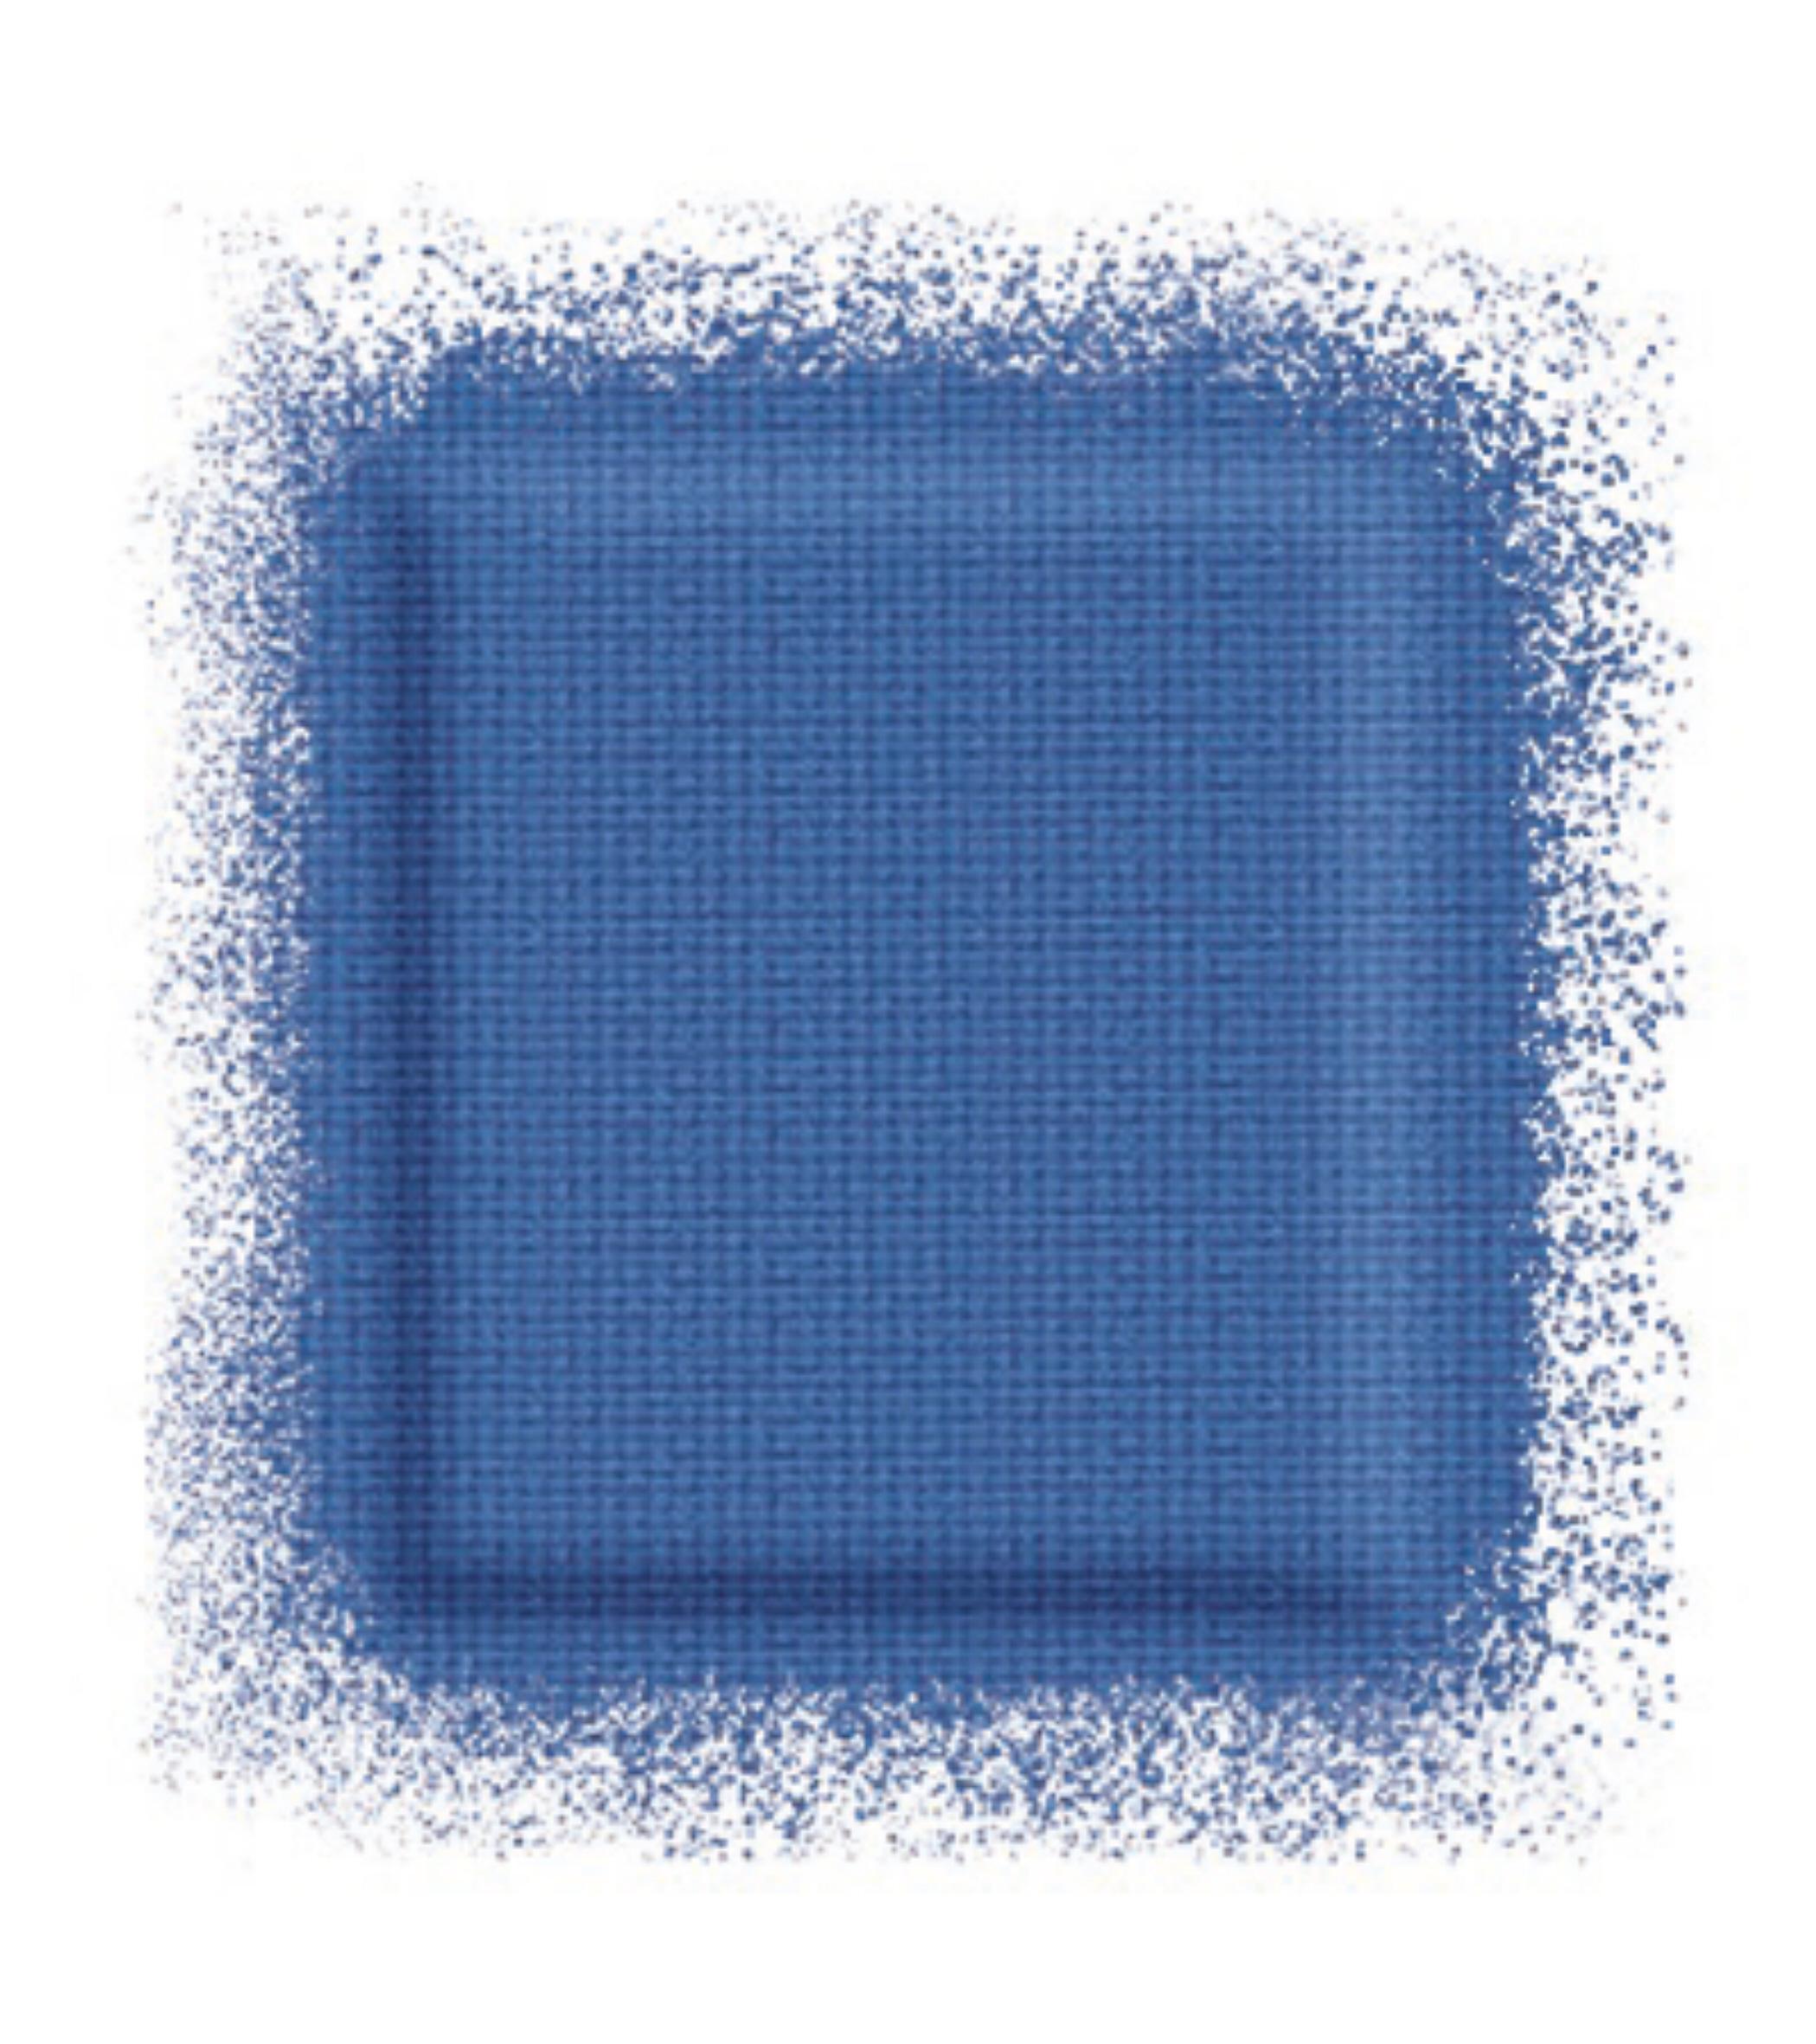 Тени для глаз Artist color shadow refill high impact eye shadow 2,5 г (M-214 Классический синий) Make Up For Ever